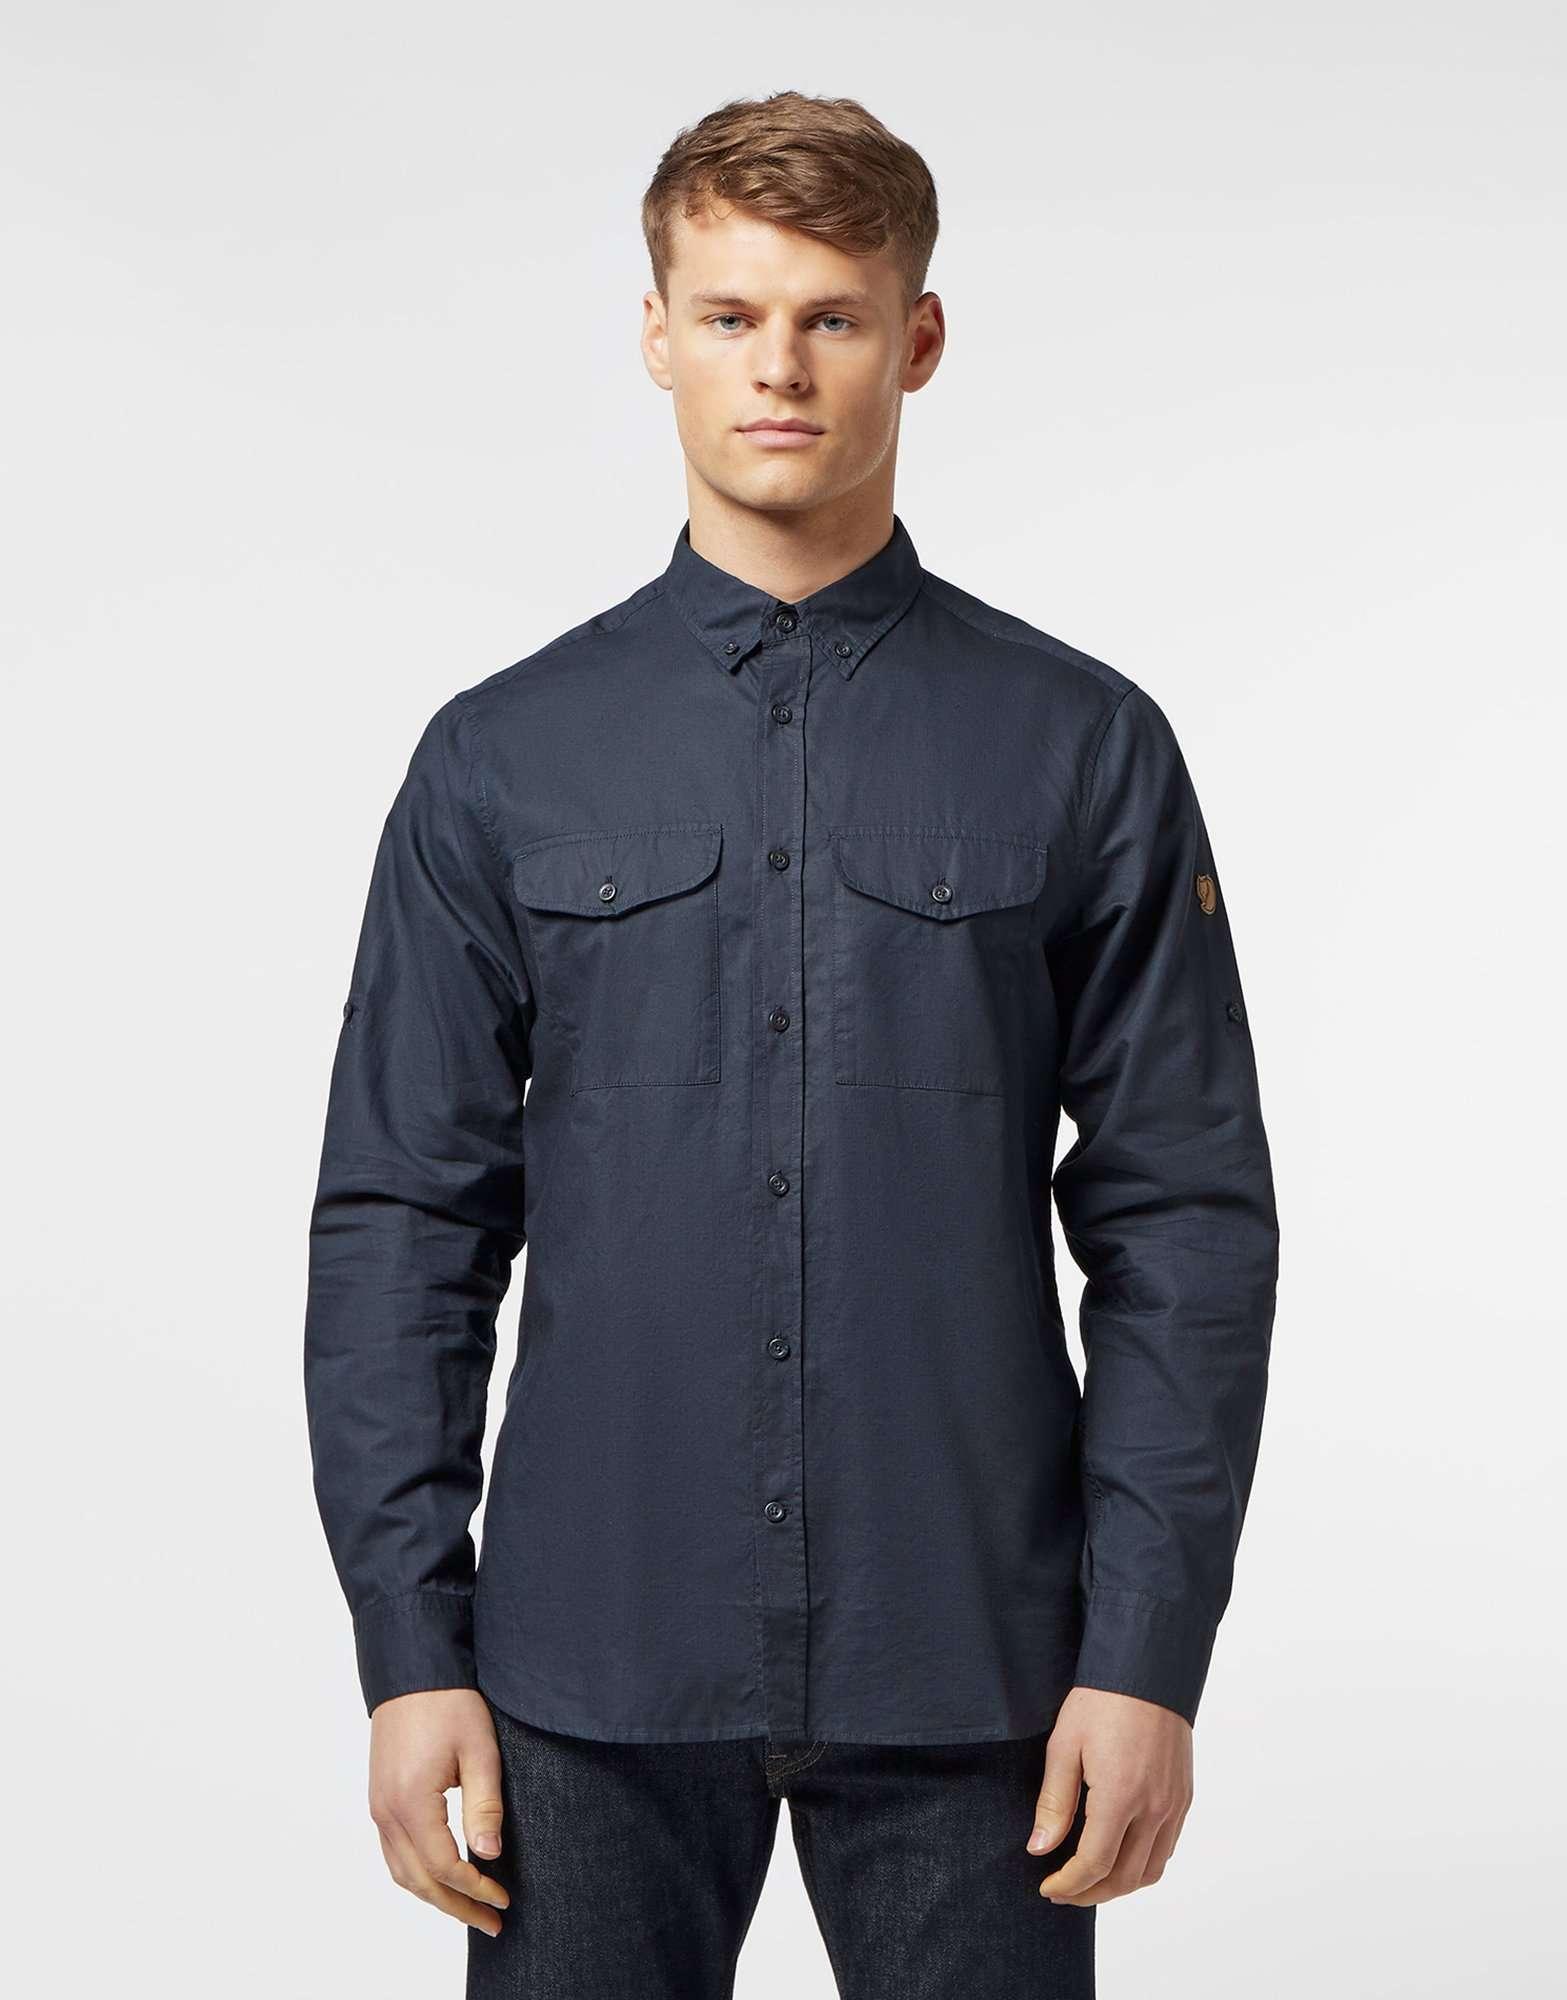 Fjallraven Ovik Long Sleeve Shirt